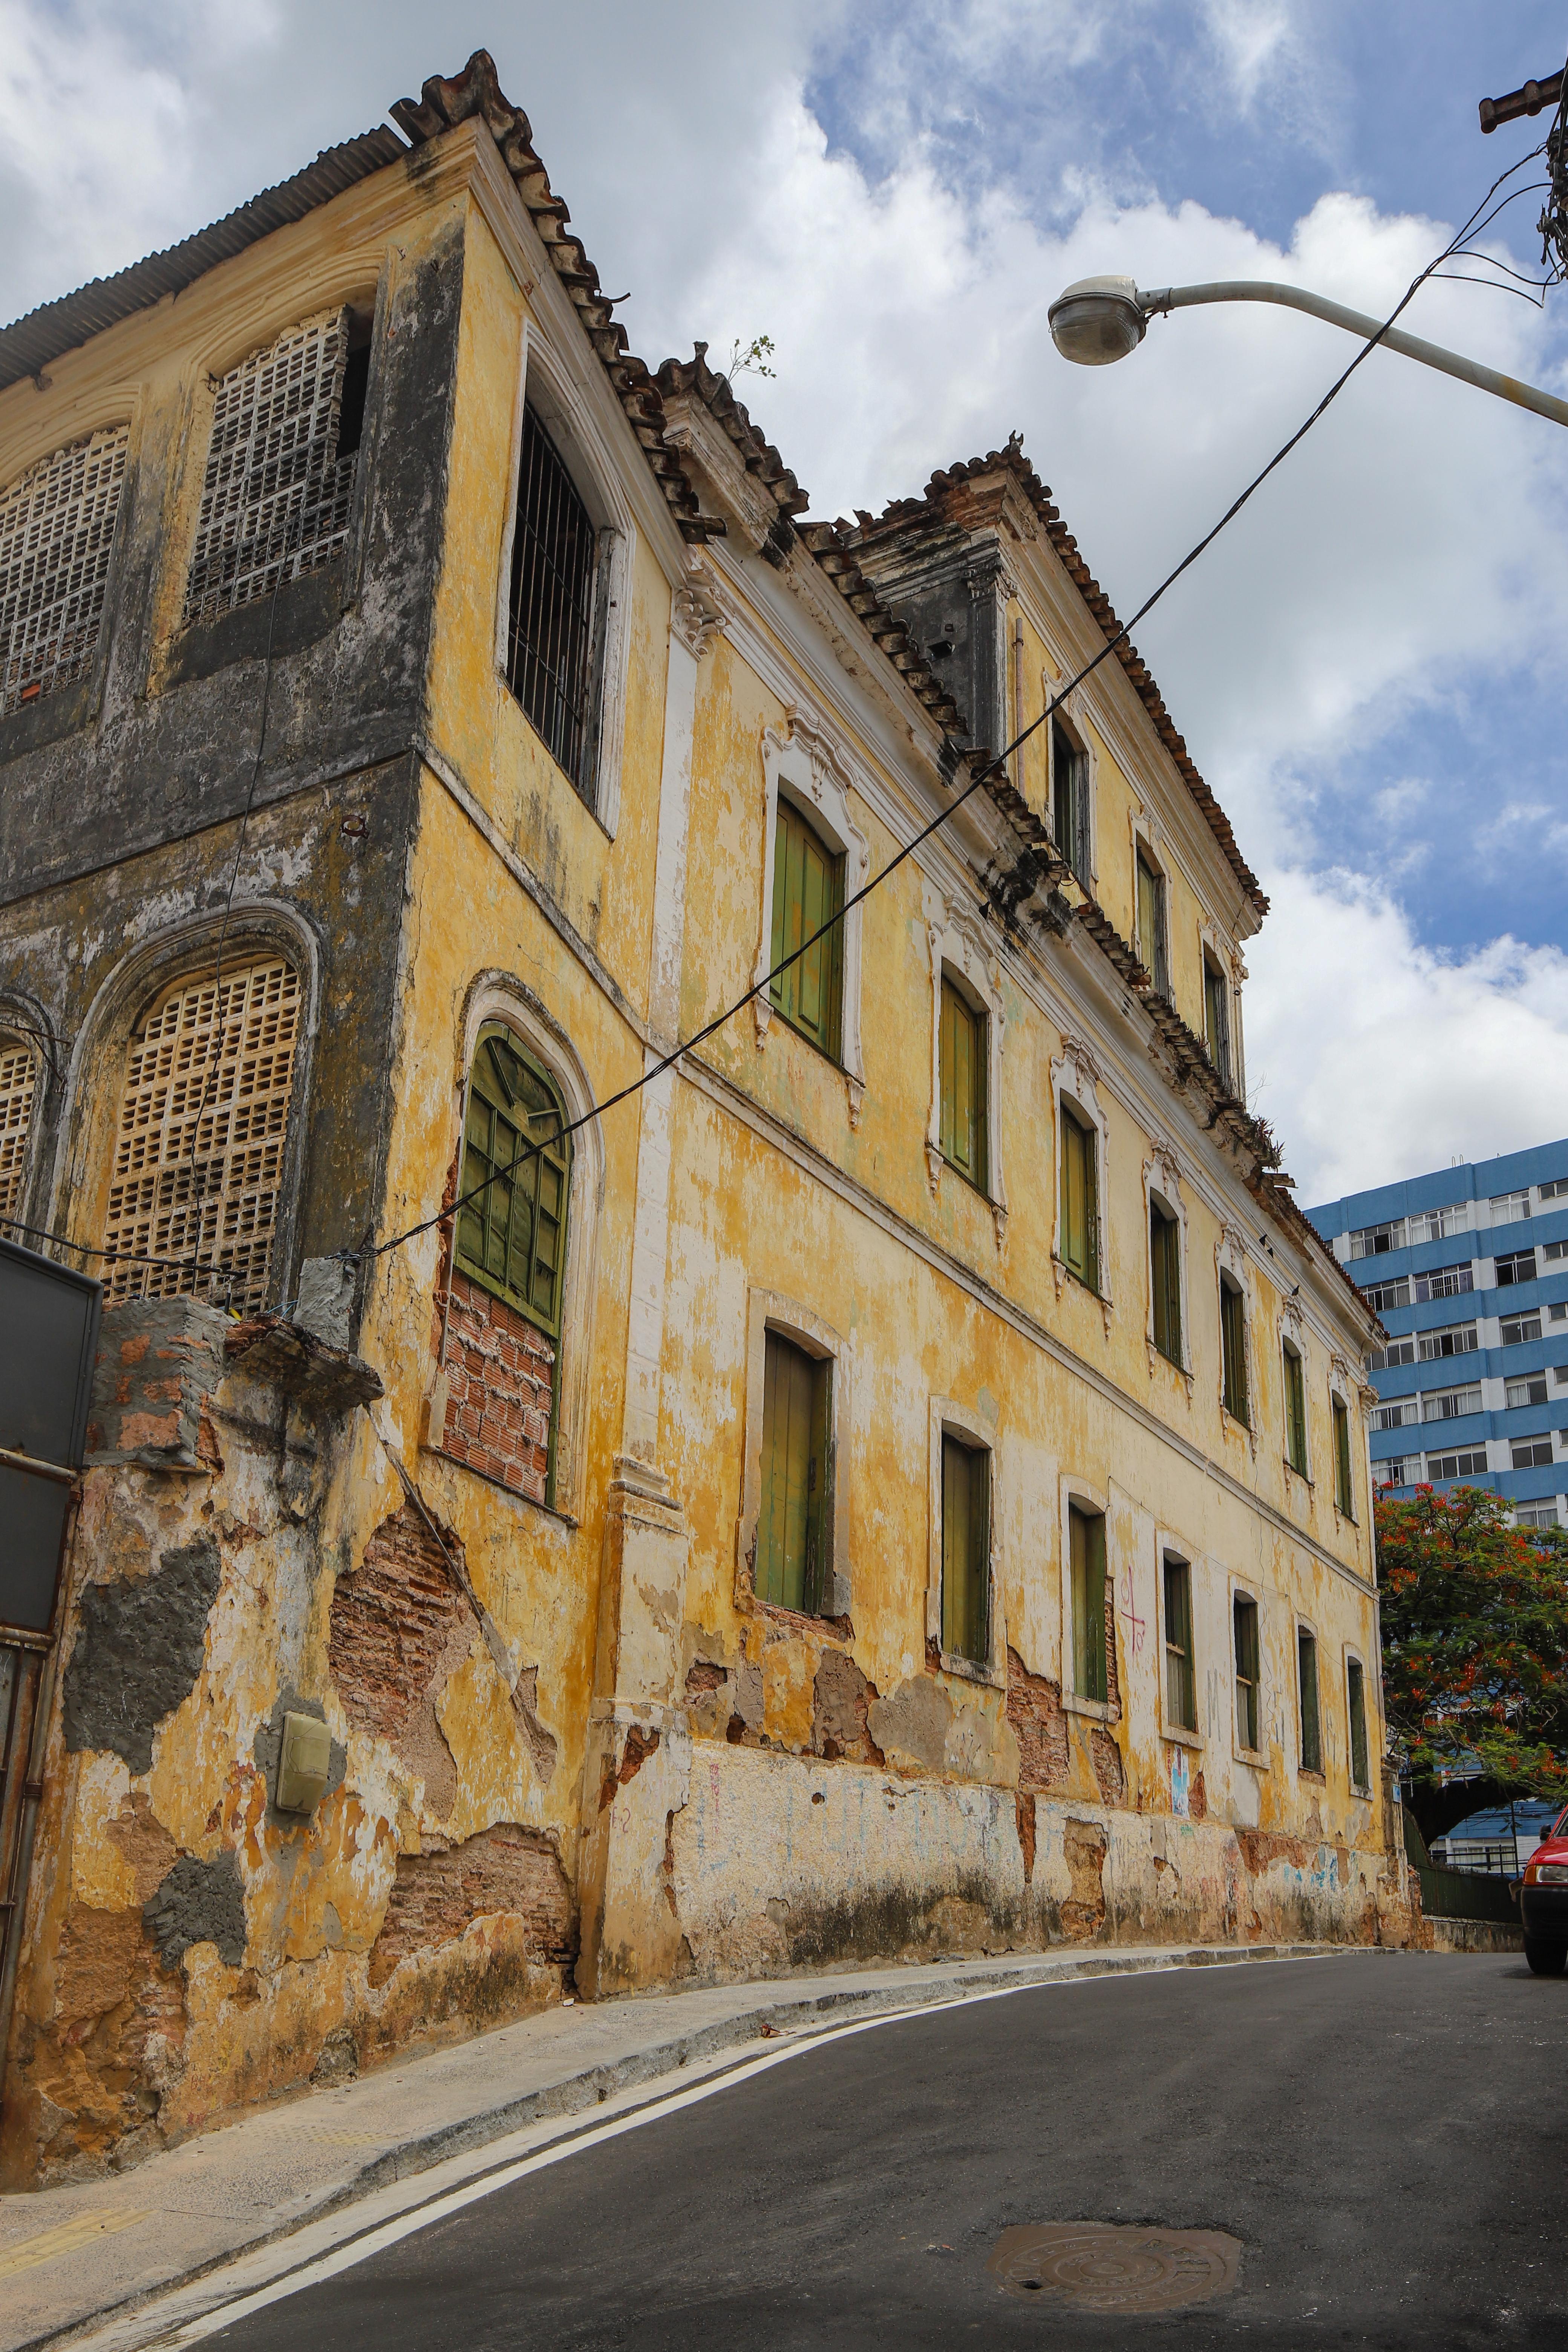 Rio Real Bahia fonte: upload.wikimedia.org